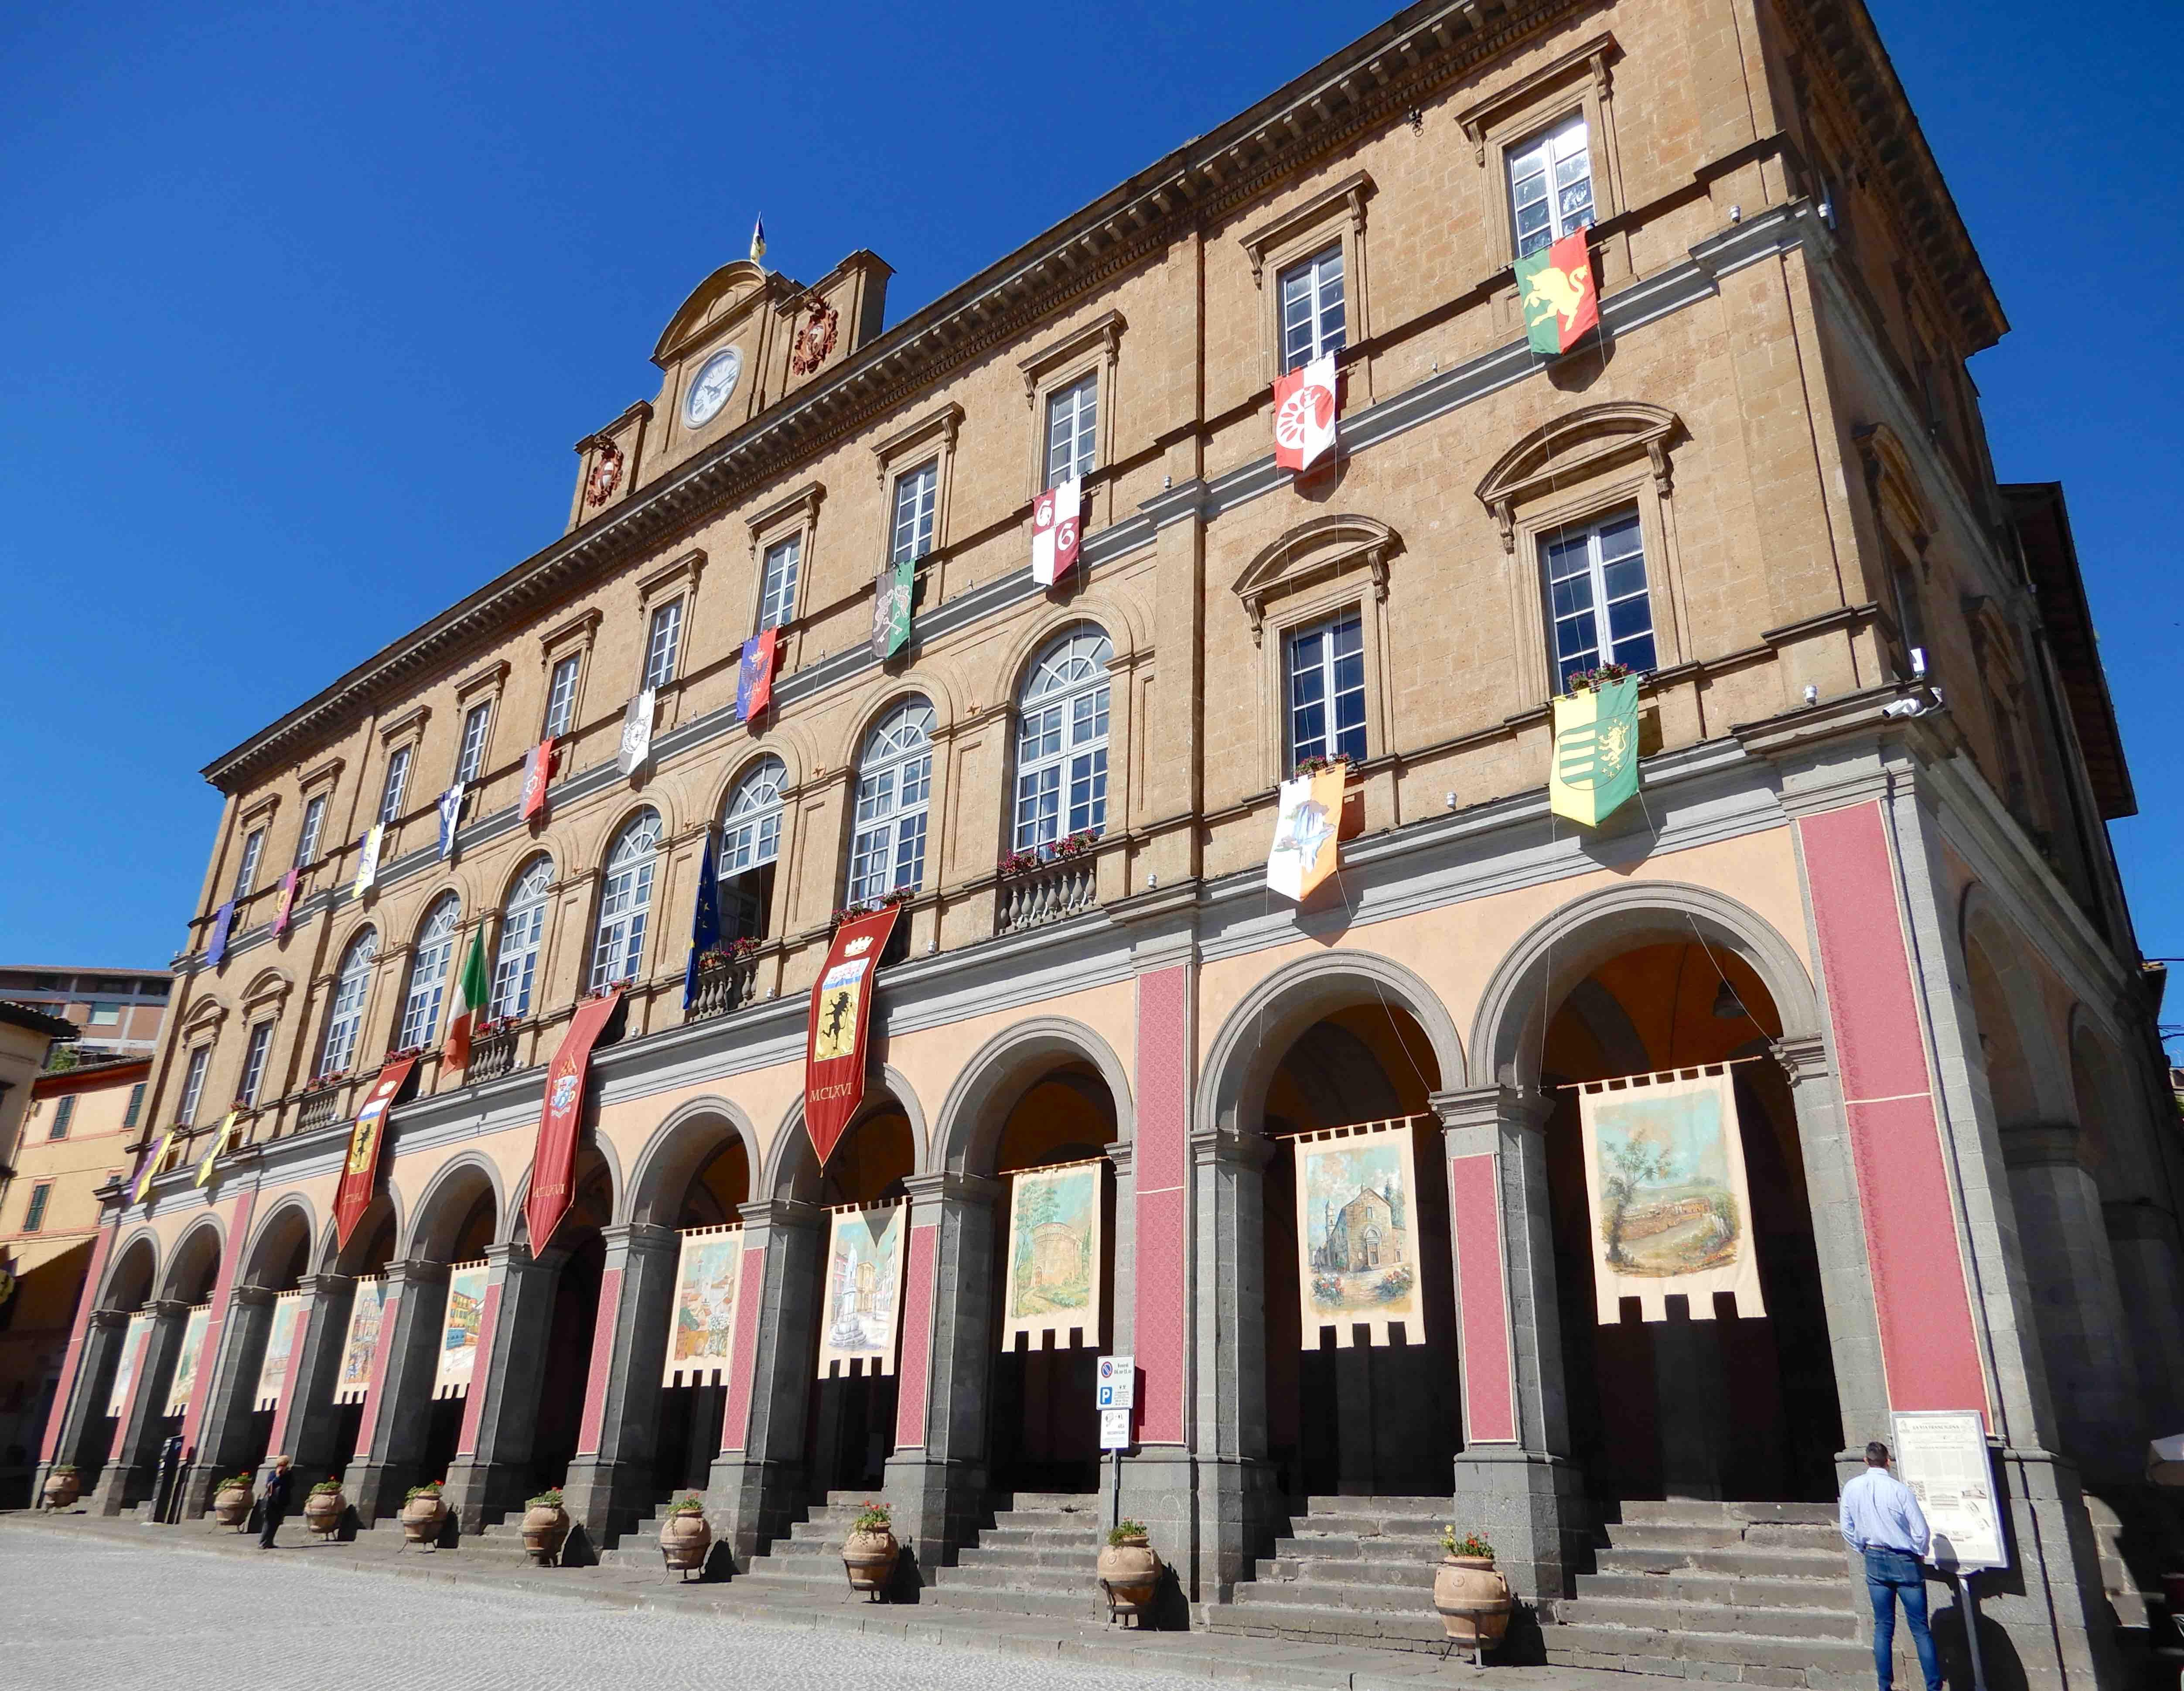 37.Town Hall